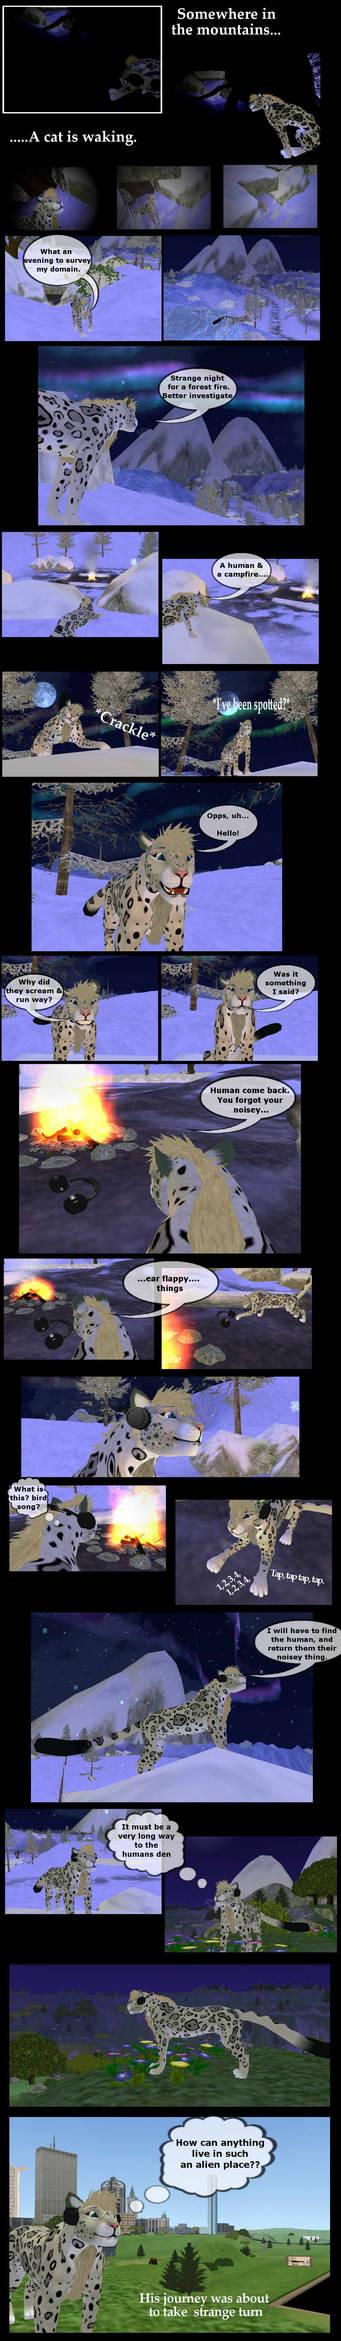 Beepaw the snowcat Comic page 1